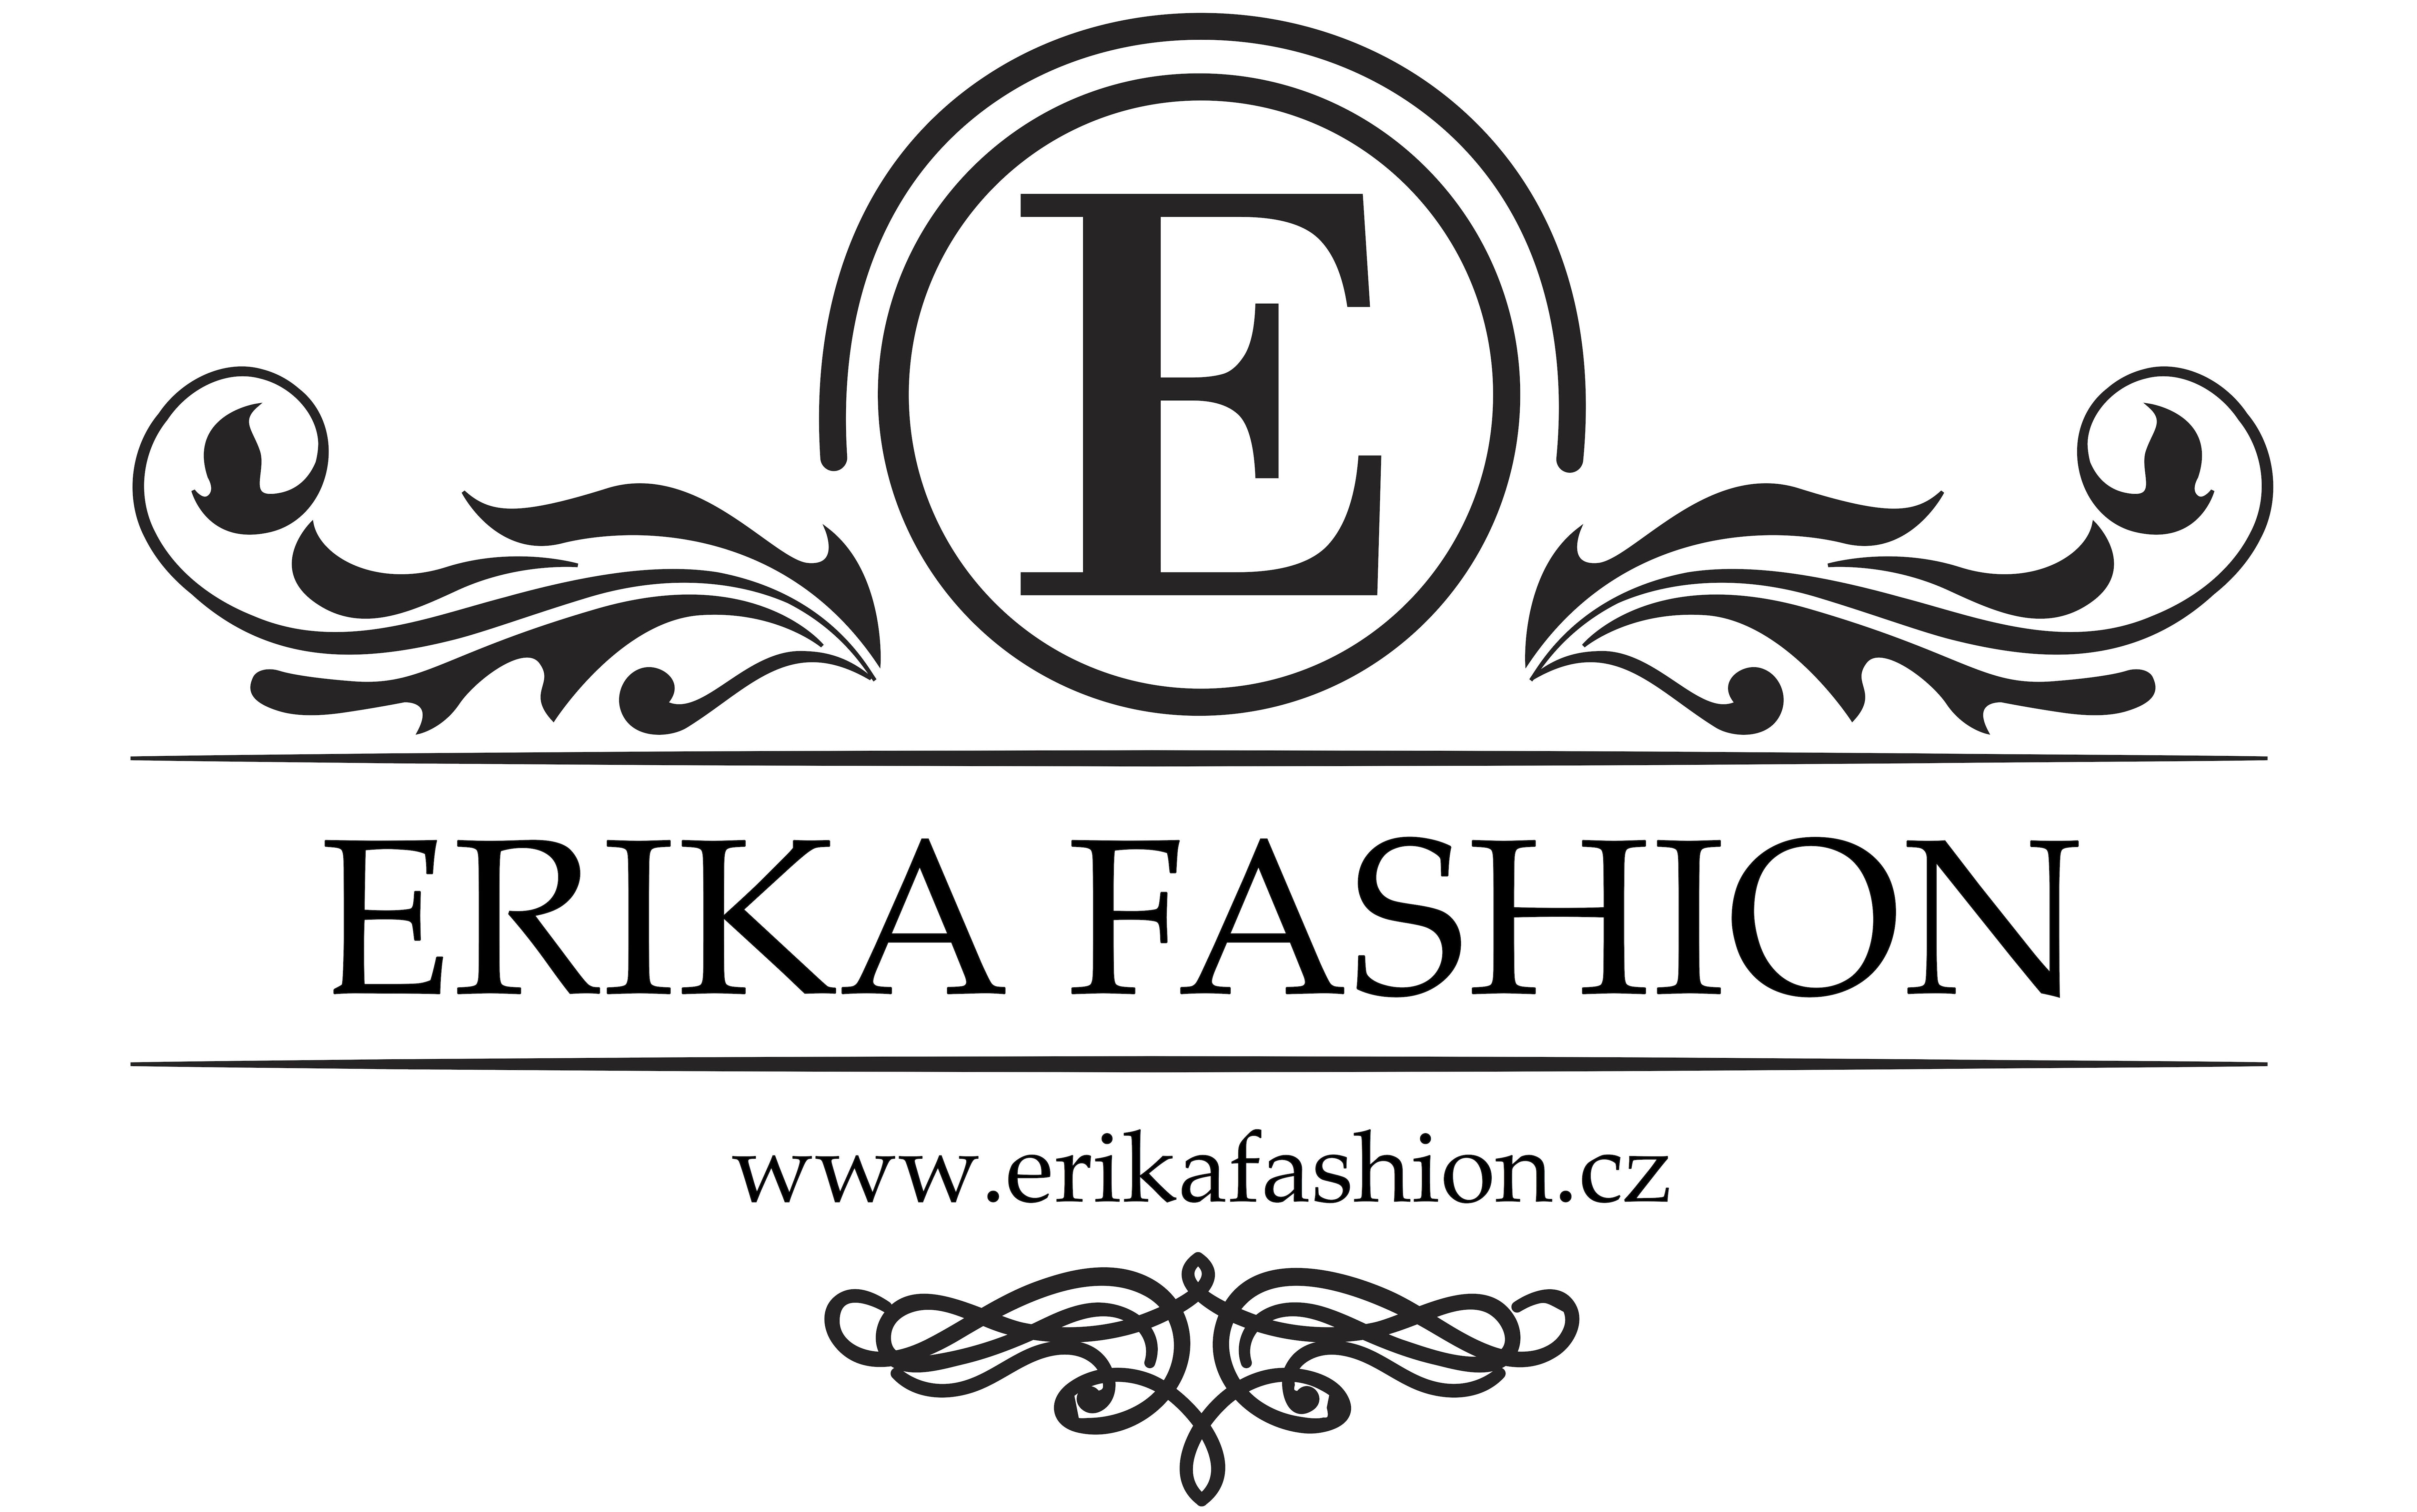 ErikaFashion.cz